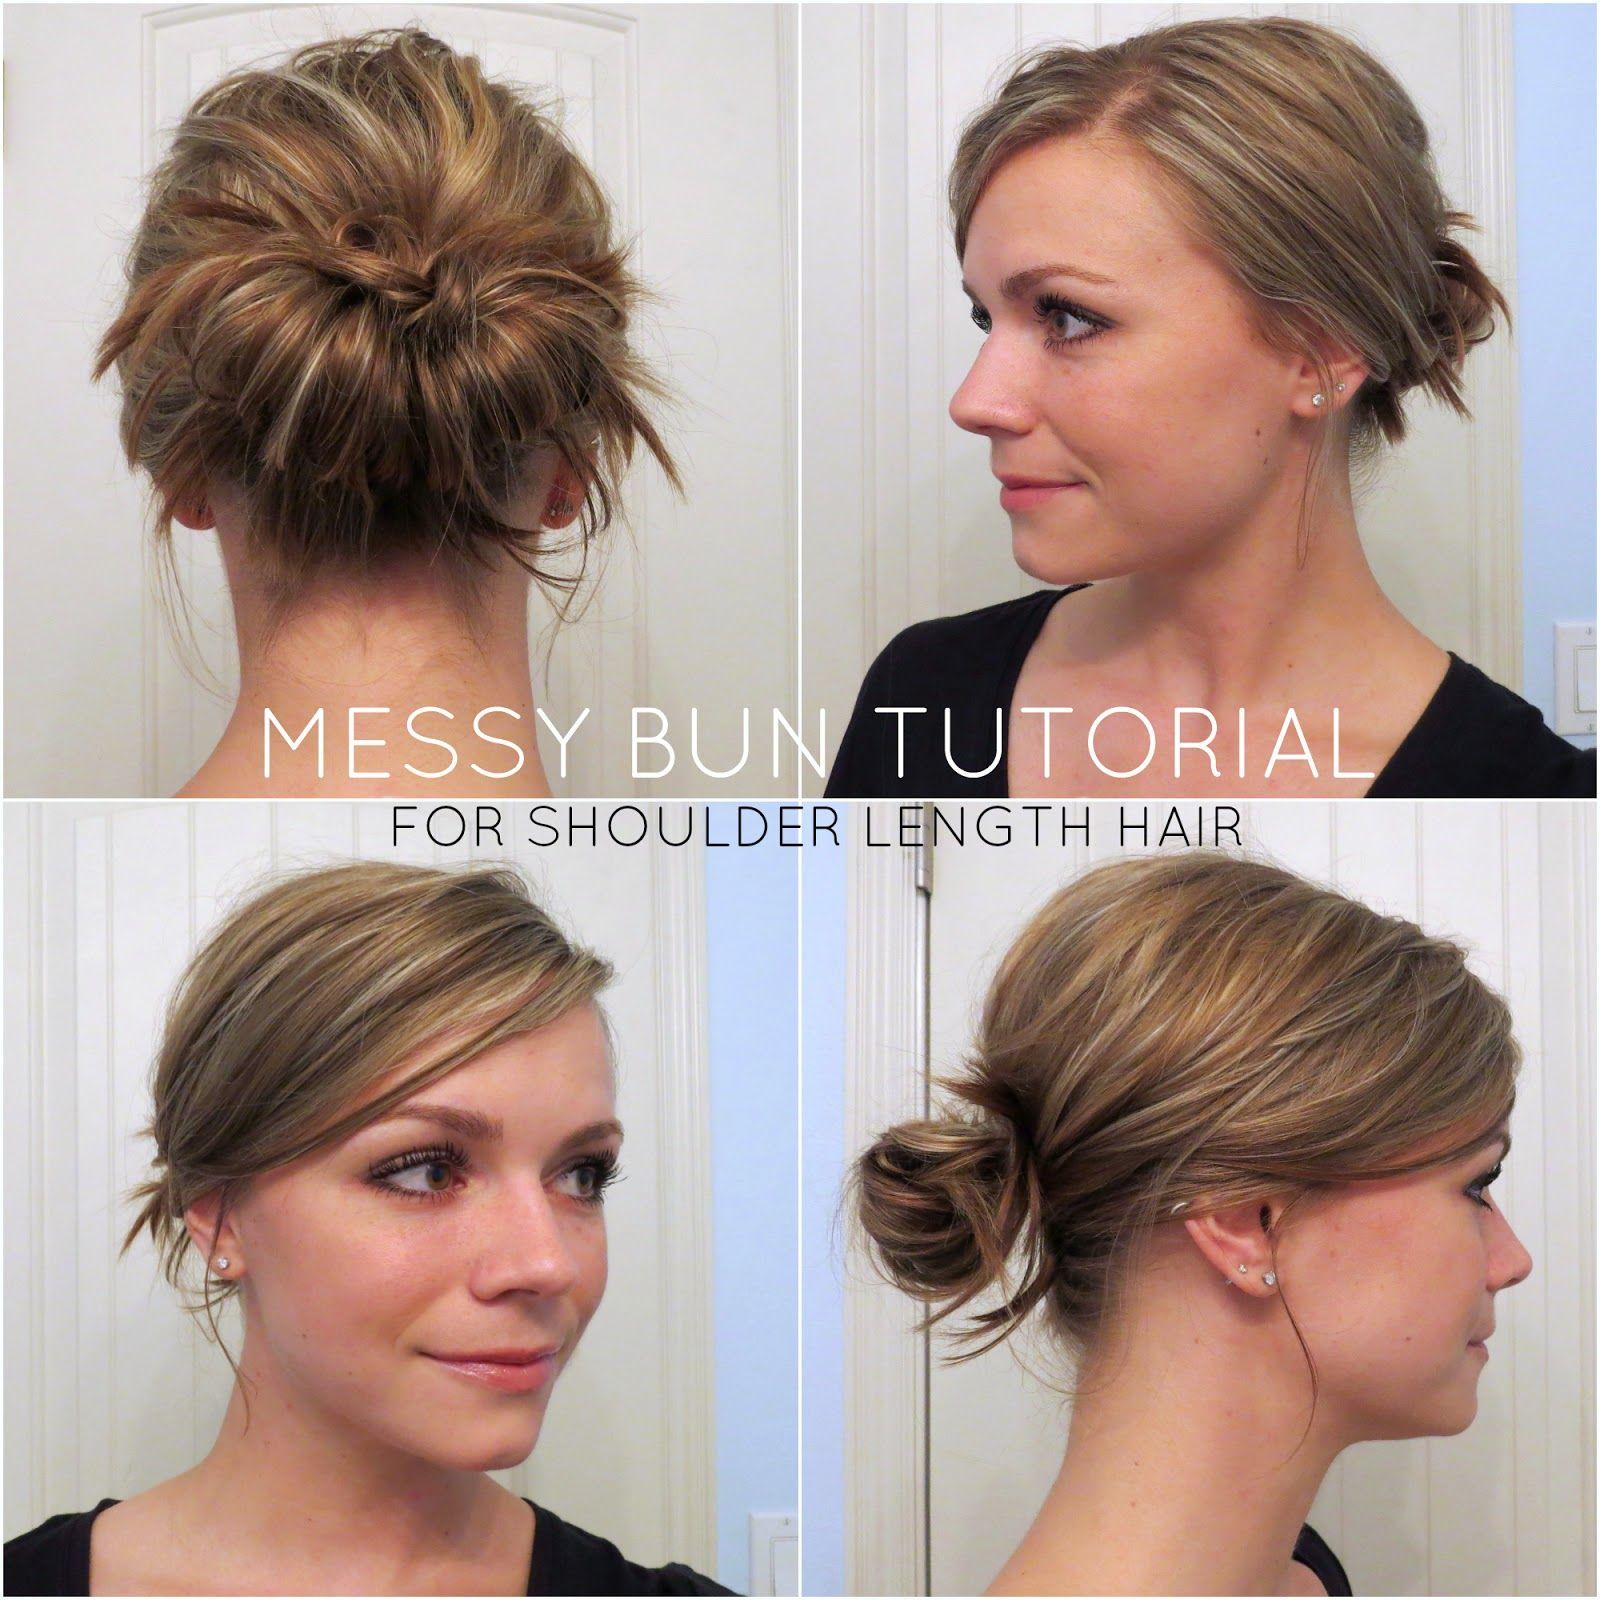 Messy Bun Tutorial For Shoulder Length Hair Chic Messy Bun Messy Bun For Short Hair Messy Bun For Short Hair Hair Bun Tutorial Easy Messy Hairstyles